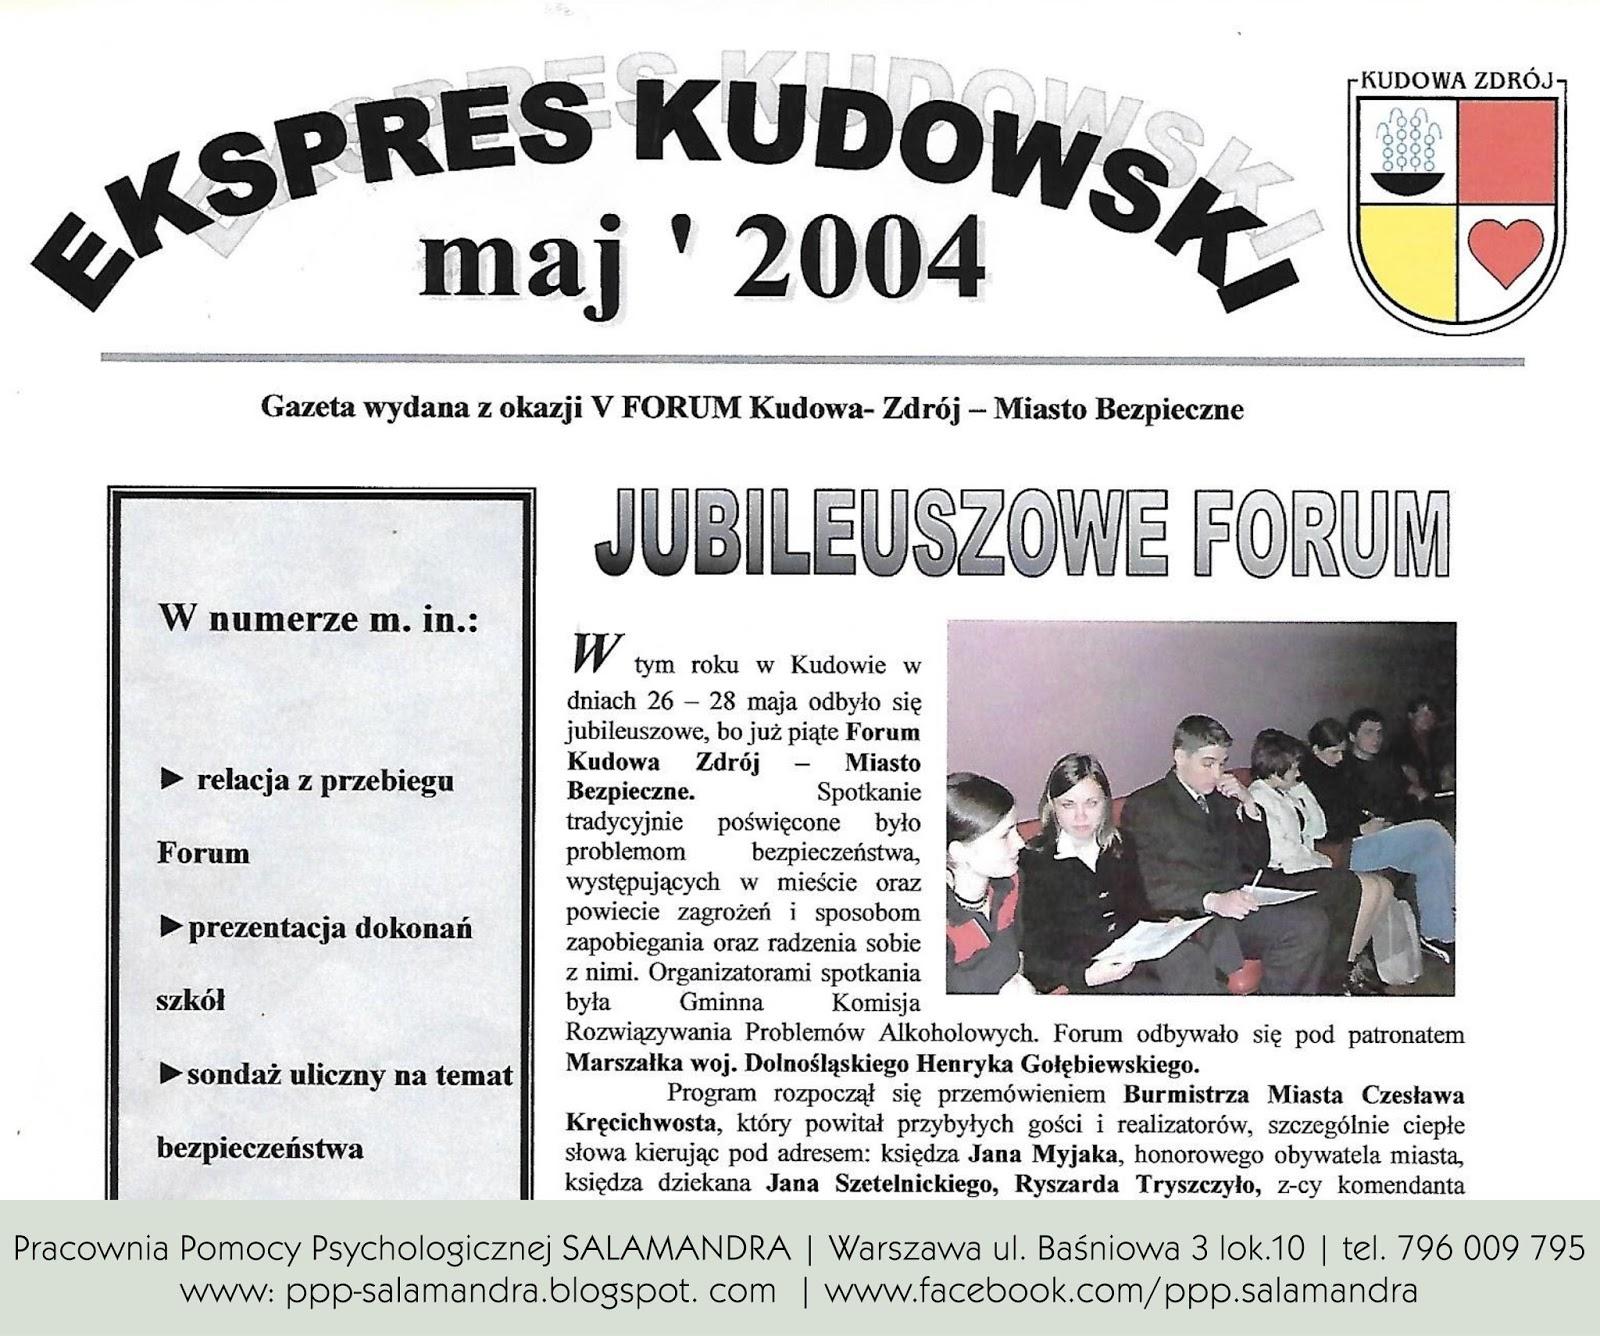 Dobry psycholog Warszawa na Forum Kudowa